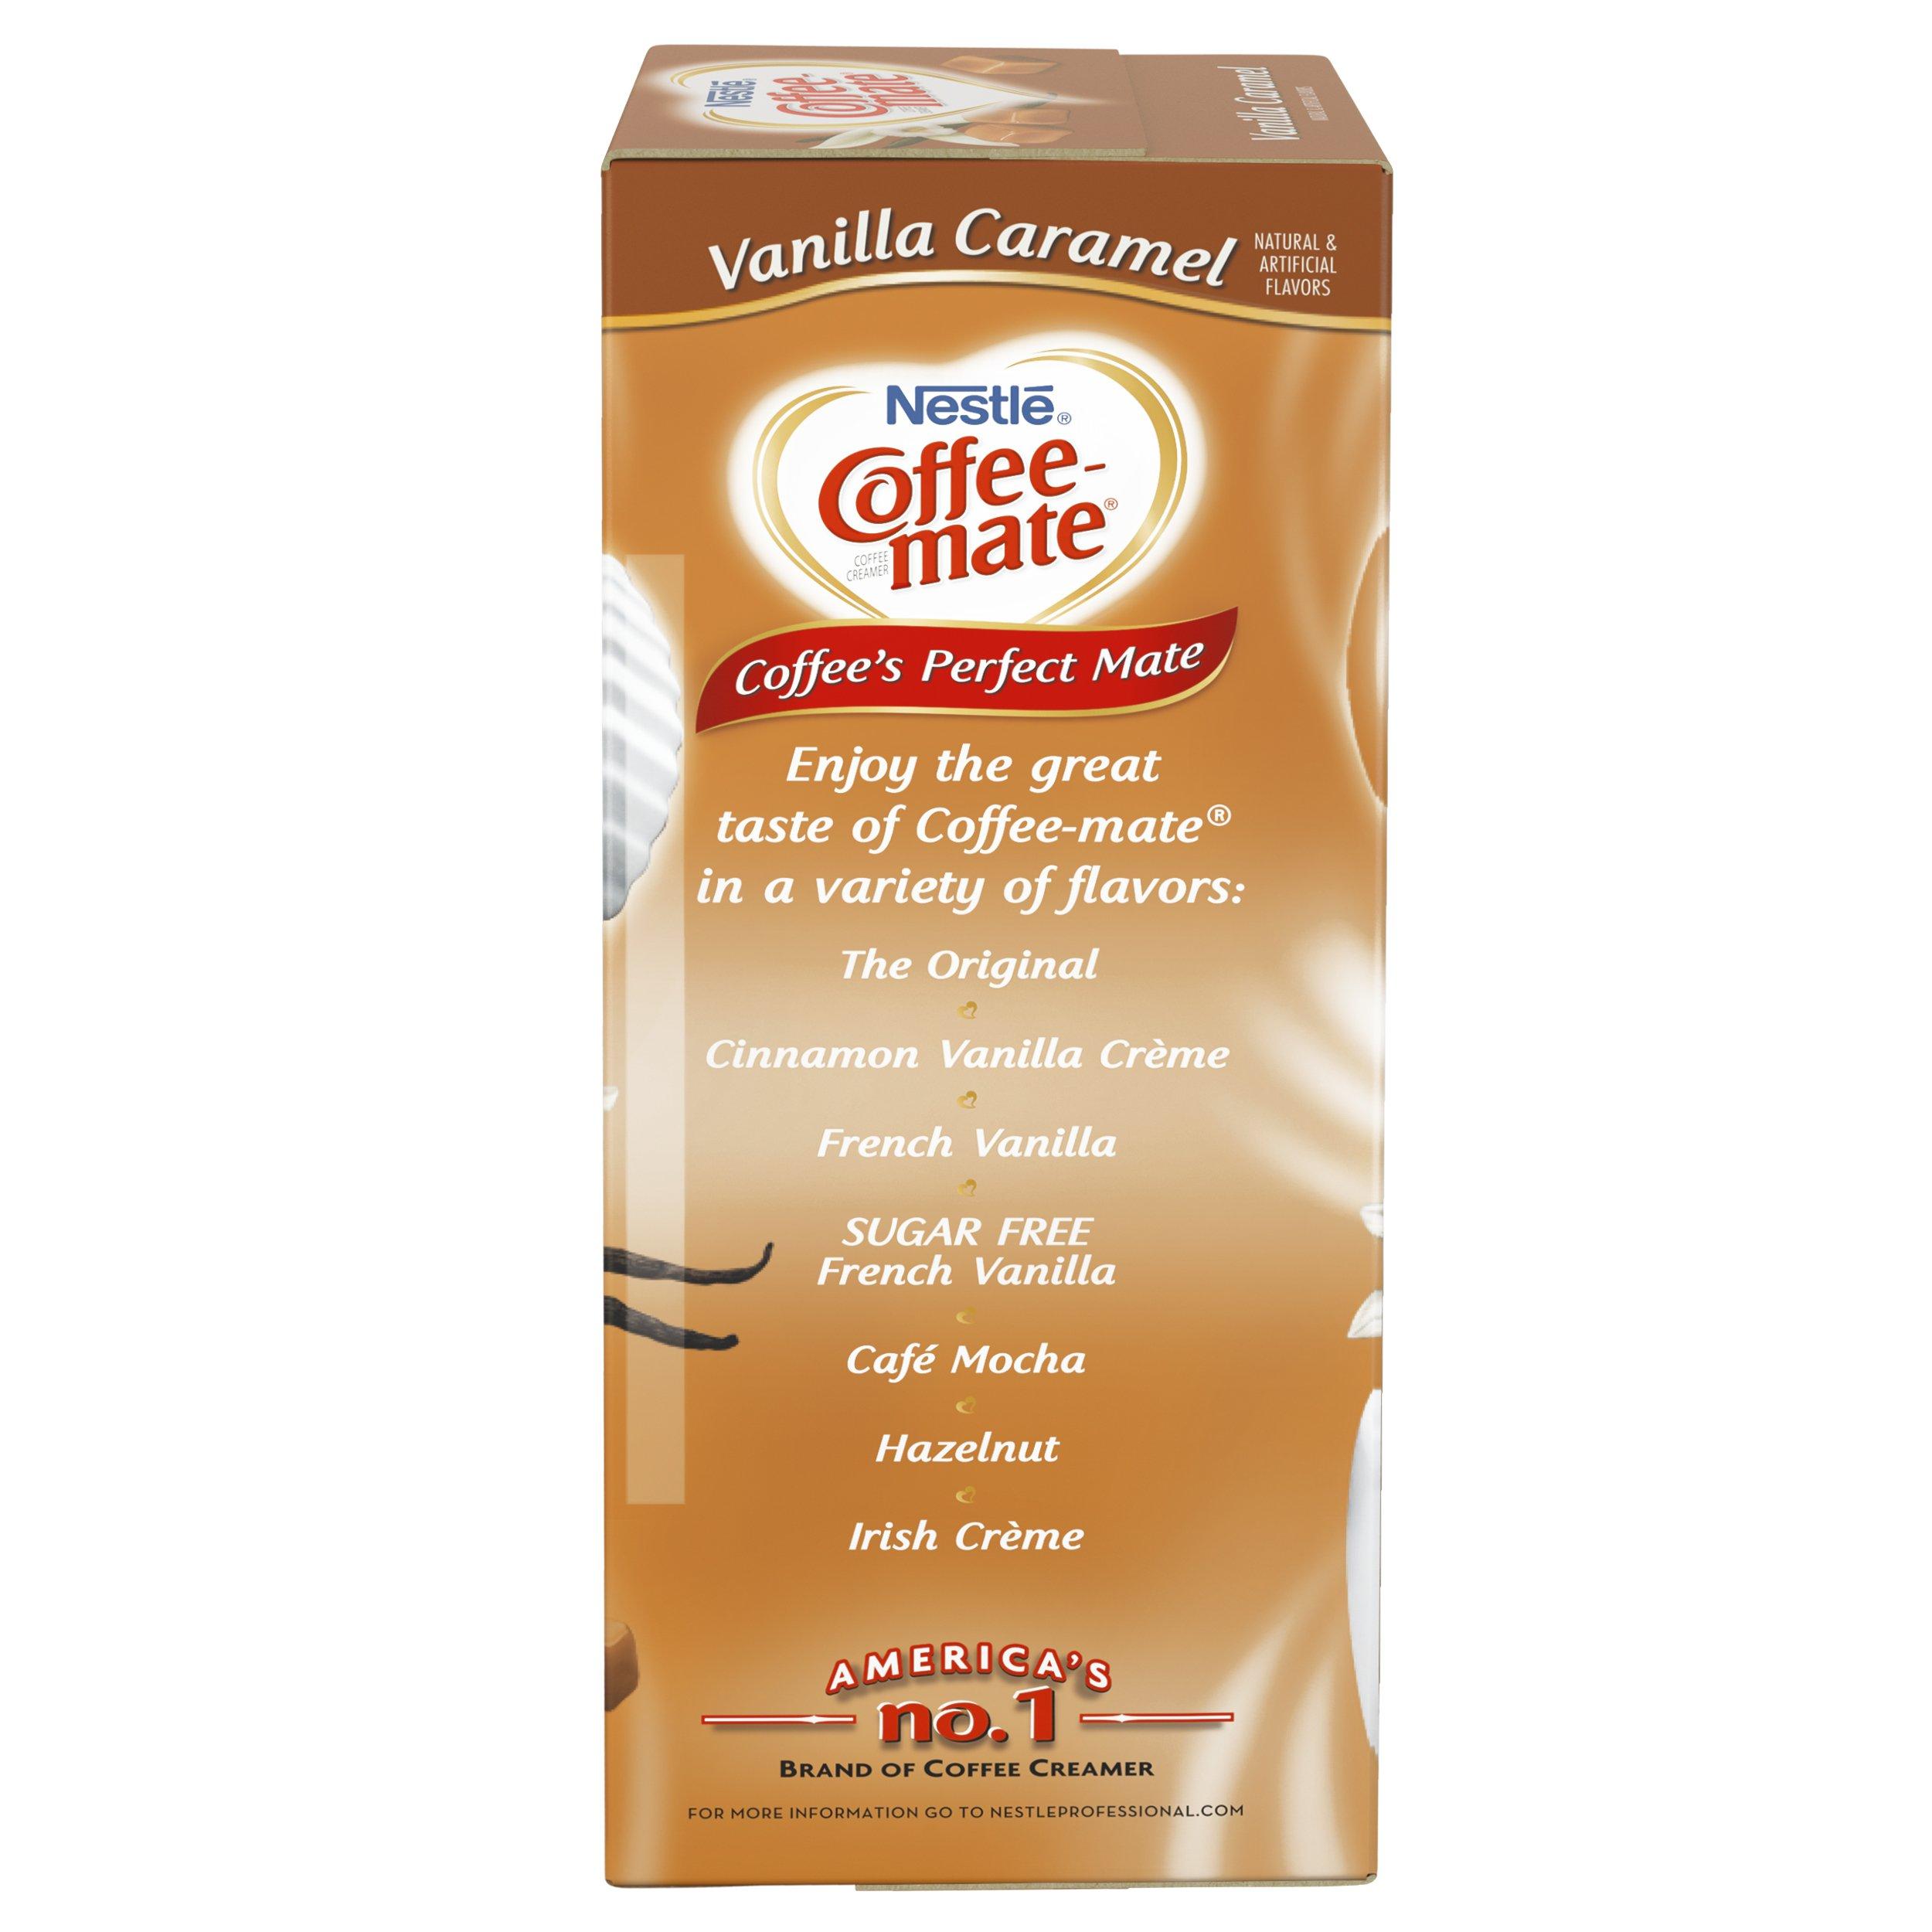 NESTLE COFFEE-MATE Coffee Creamer, Vanilla Caramel, liquid creamer singles, Pack of 50 by Nestle Coffee Mate (Image #5)